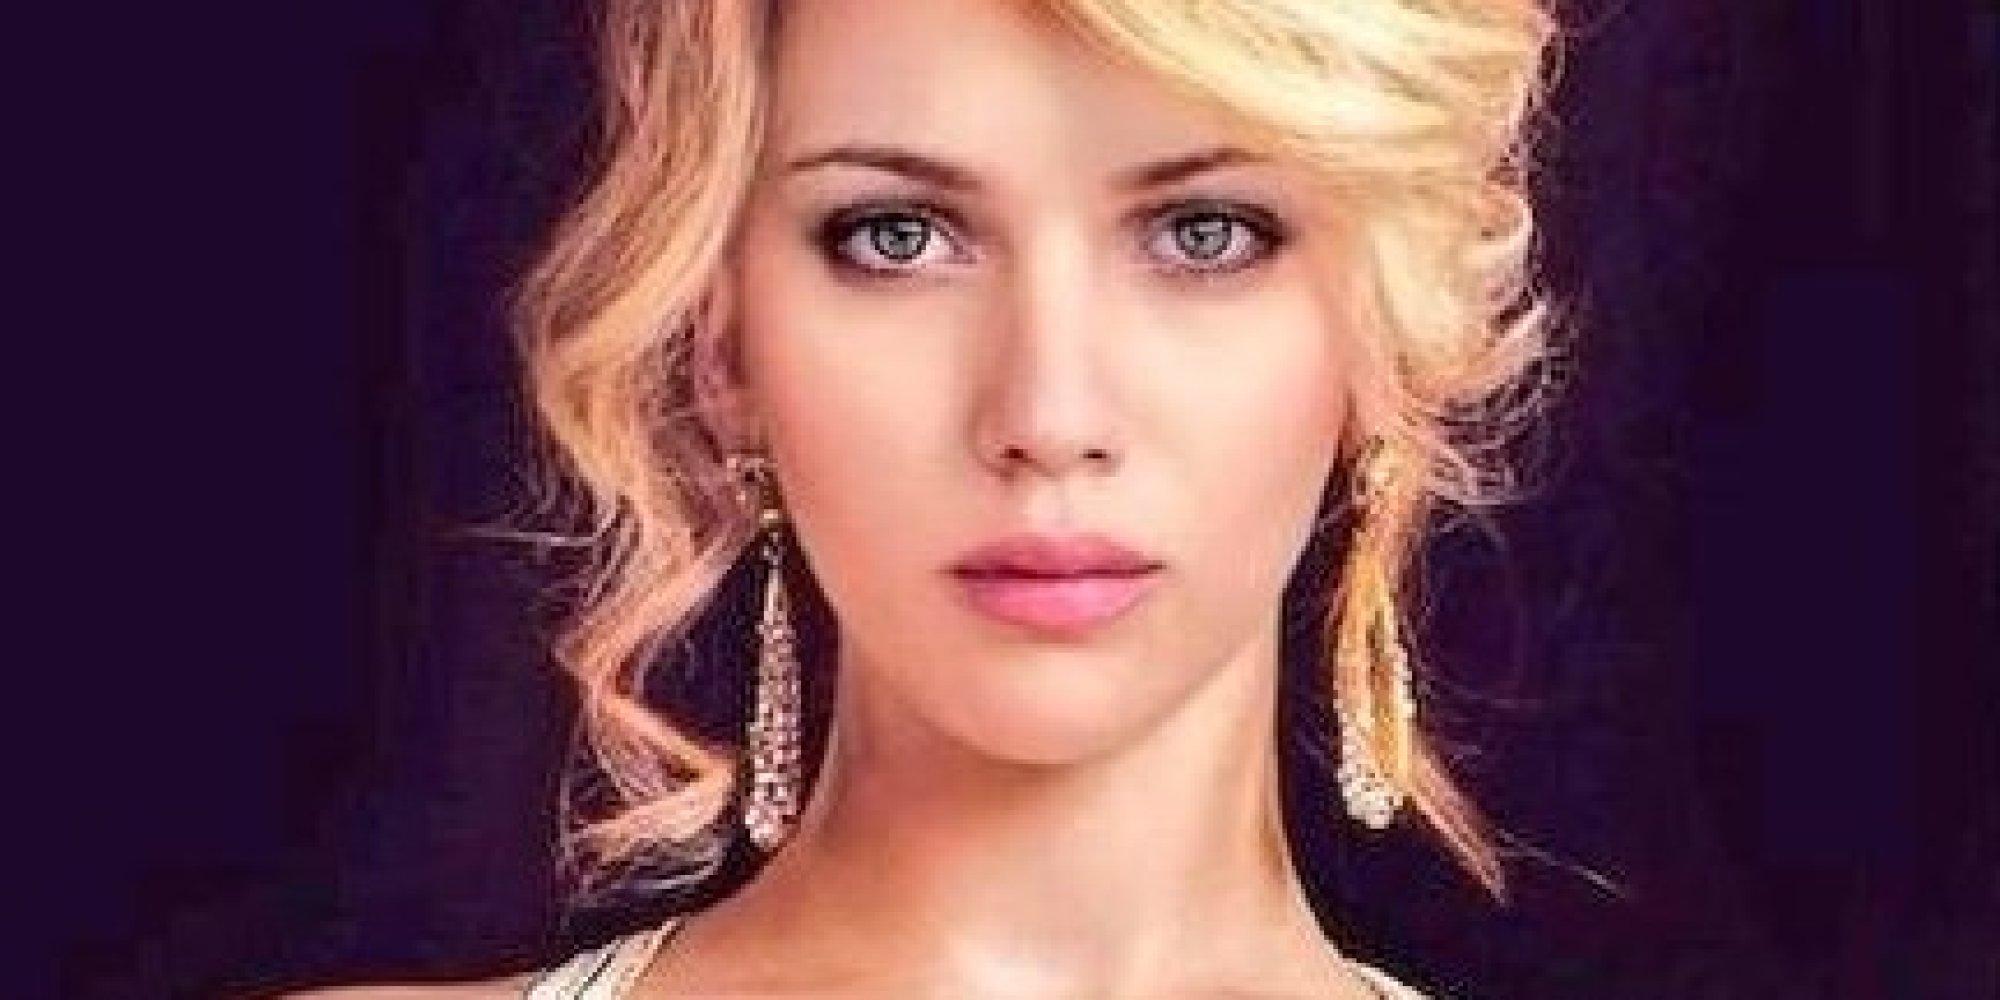 Johansson Scarlett Jennifer Lawrence Mixed